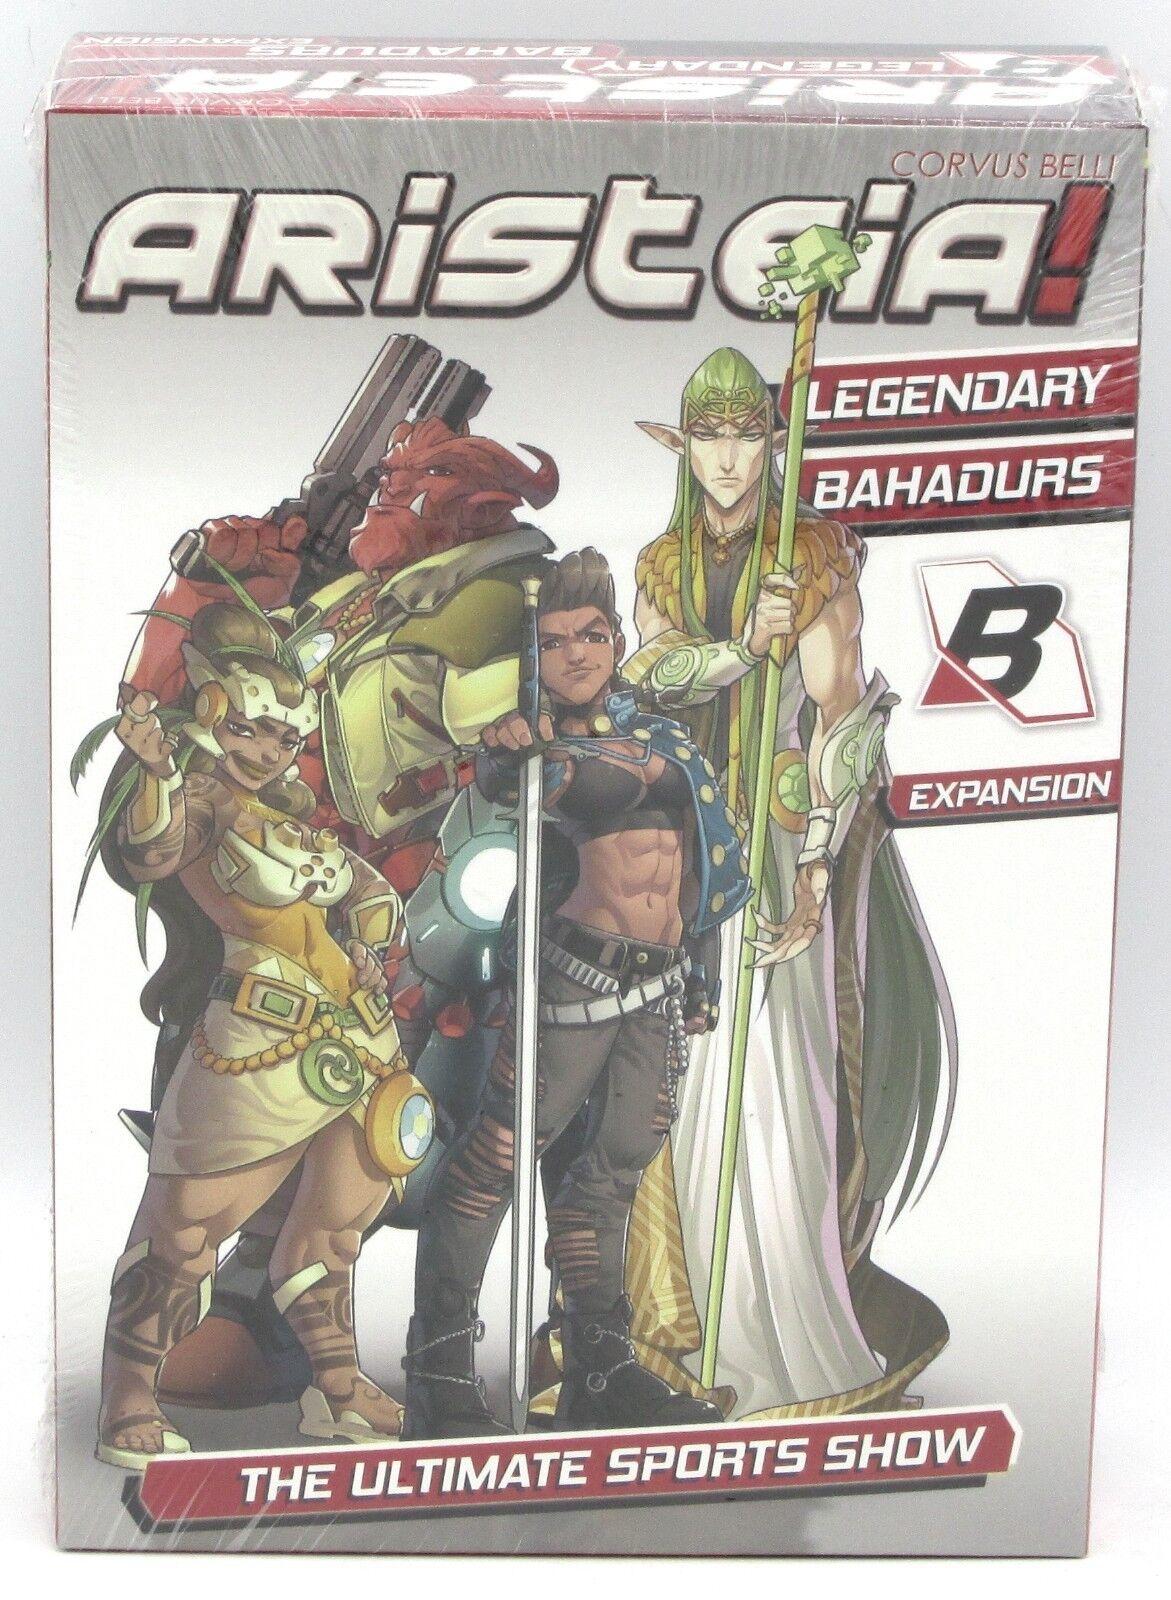 Aristeia  CBARI25 Legendary Bahadurs (Expansion) Champion Players Infinity NIB